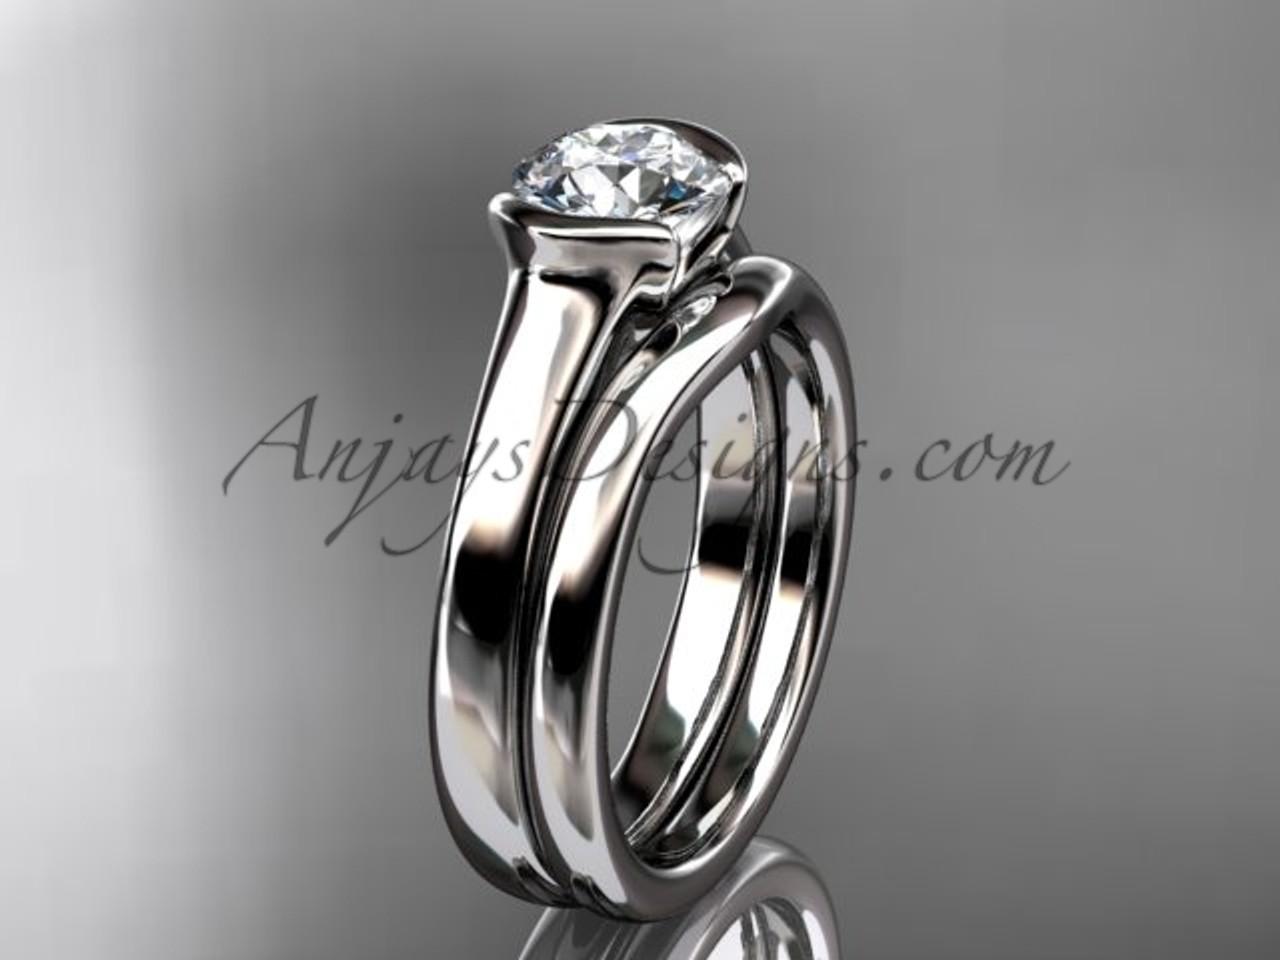 Platinum Wedding Rings.Beautiful Engagement Rings Platinum Wedding Ring Set Vd10016s